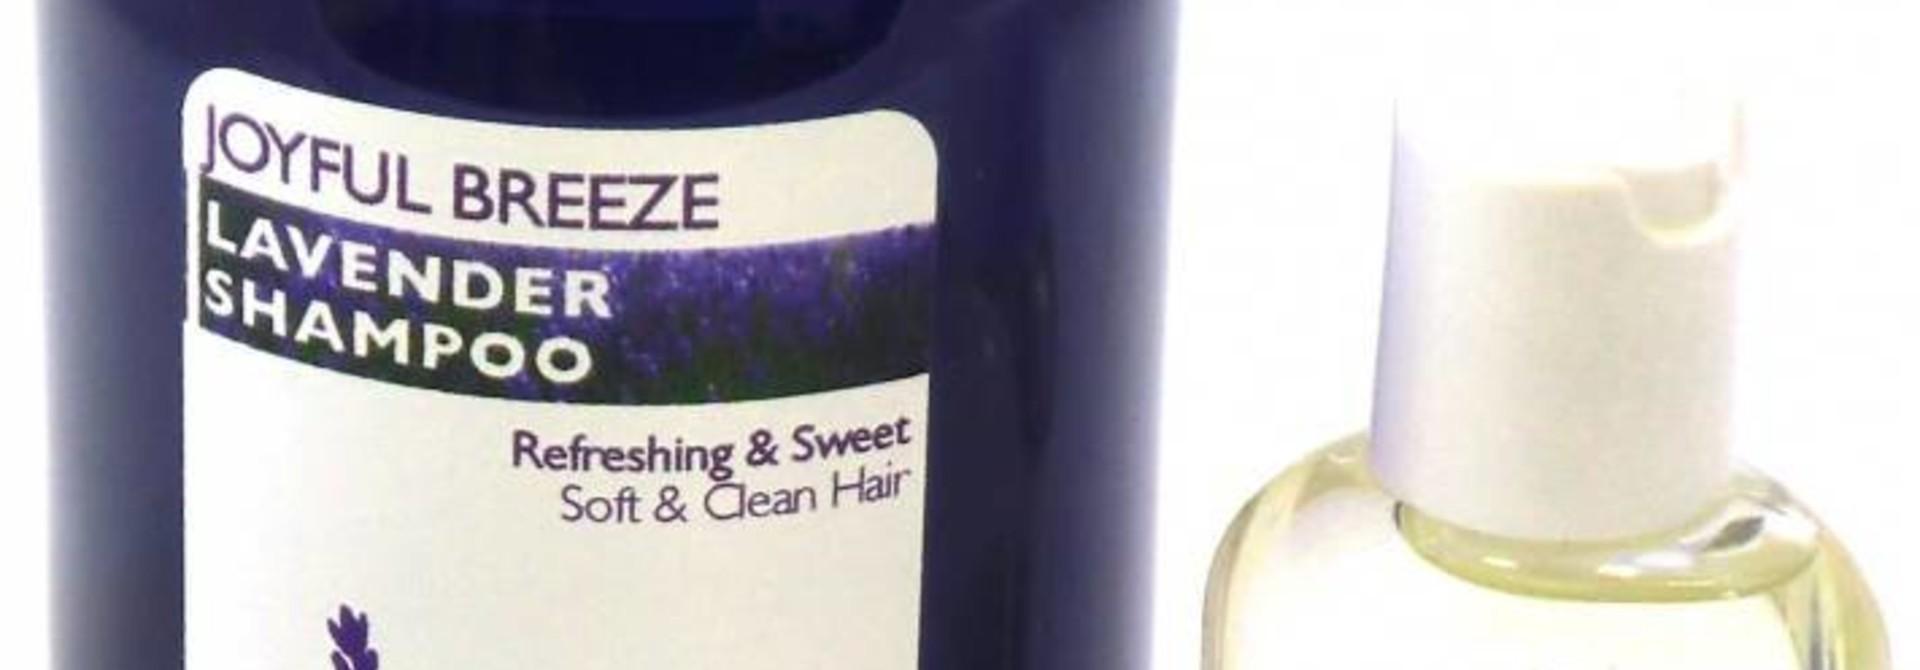 Joyful Breeze Lavender Shampoo - 16oz.